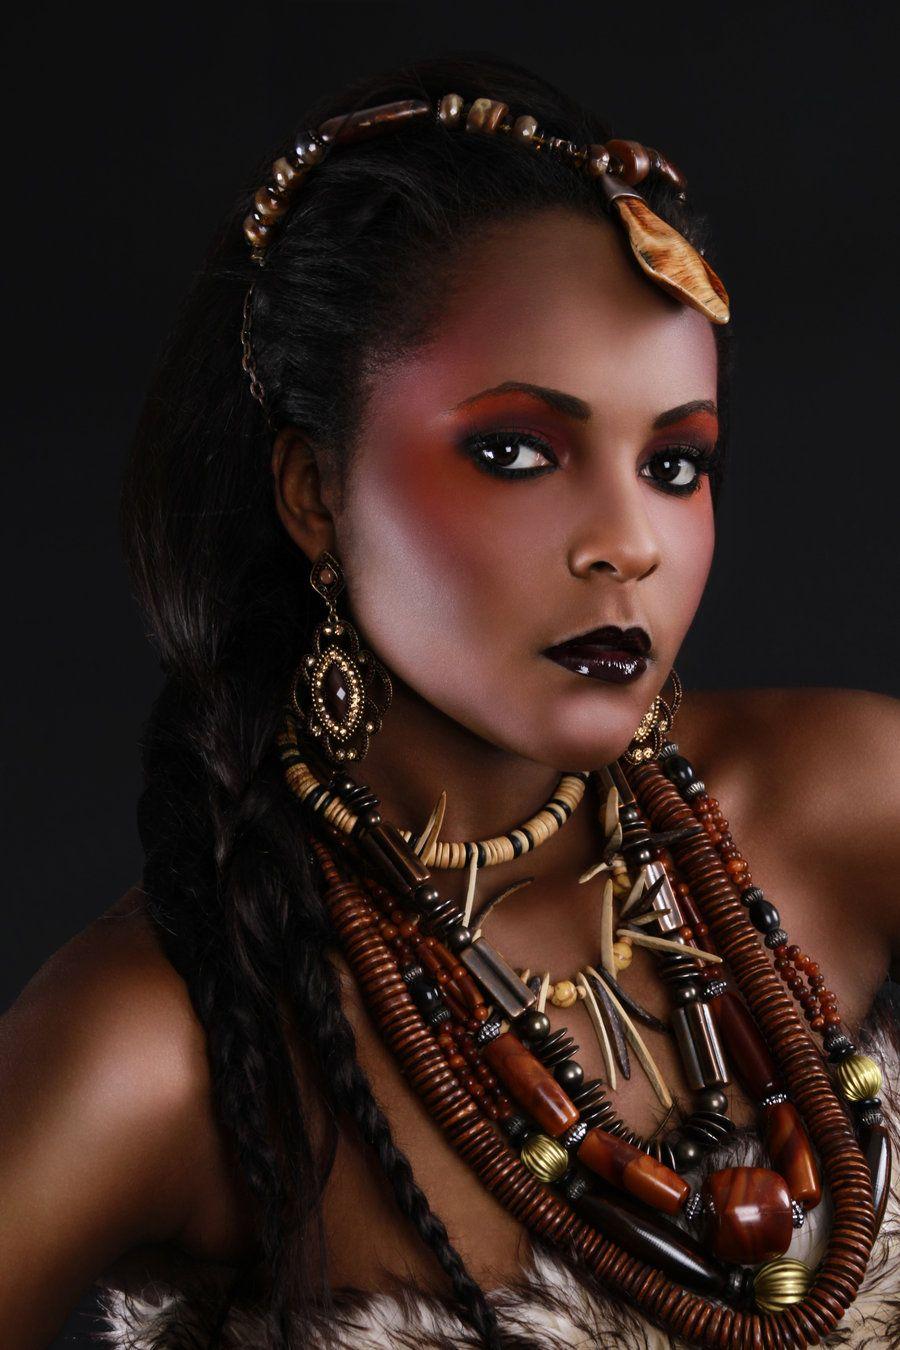 african tribal fashion - Google Search | African Fashion ...